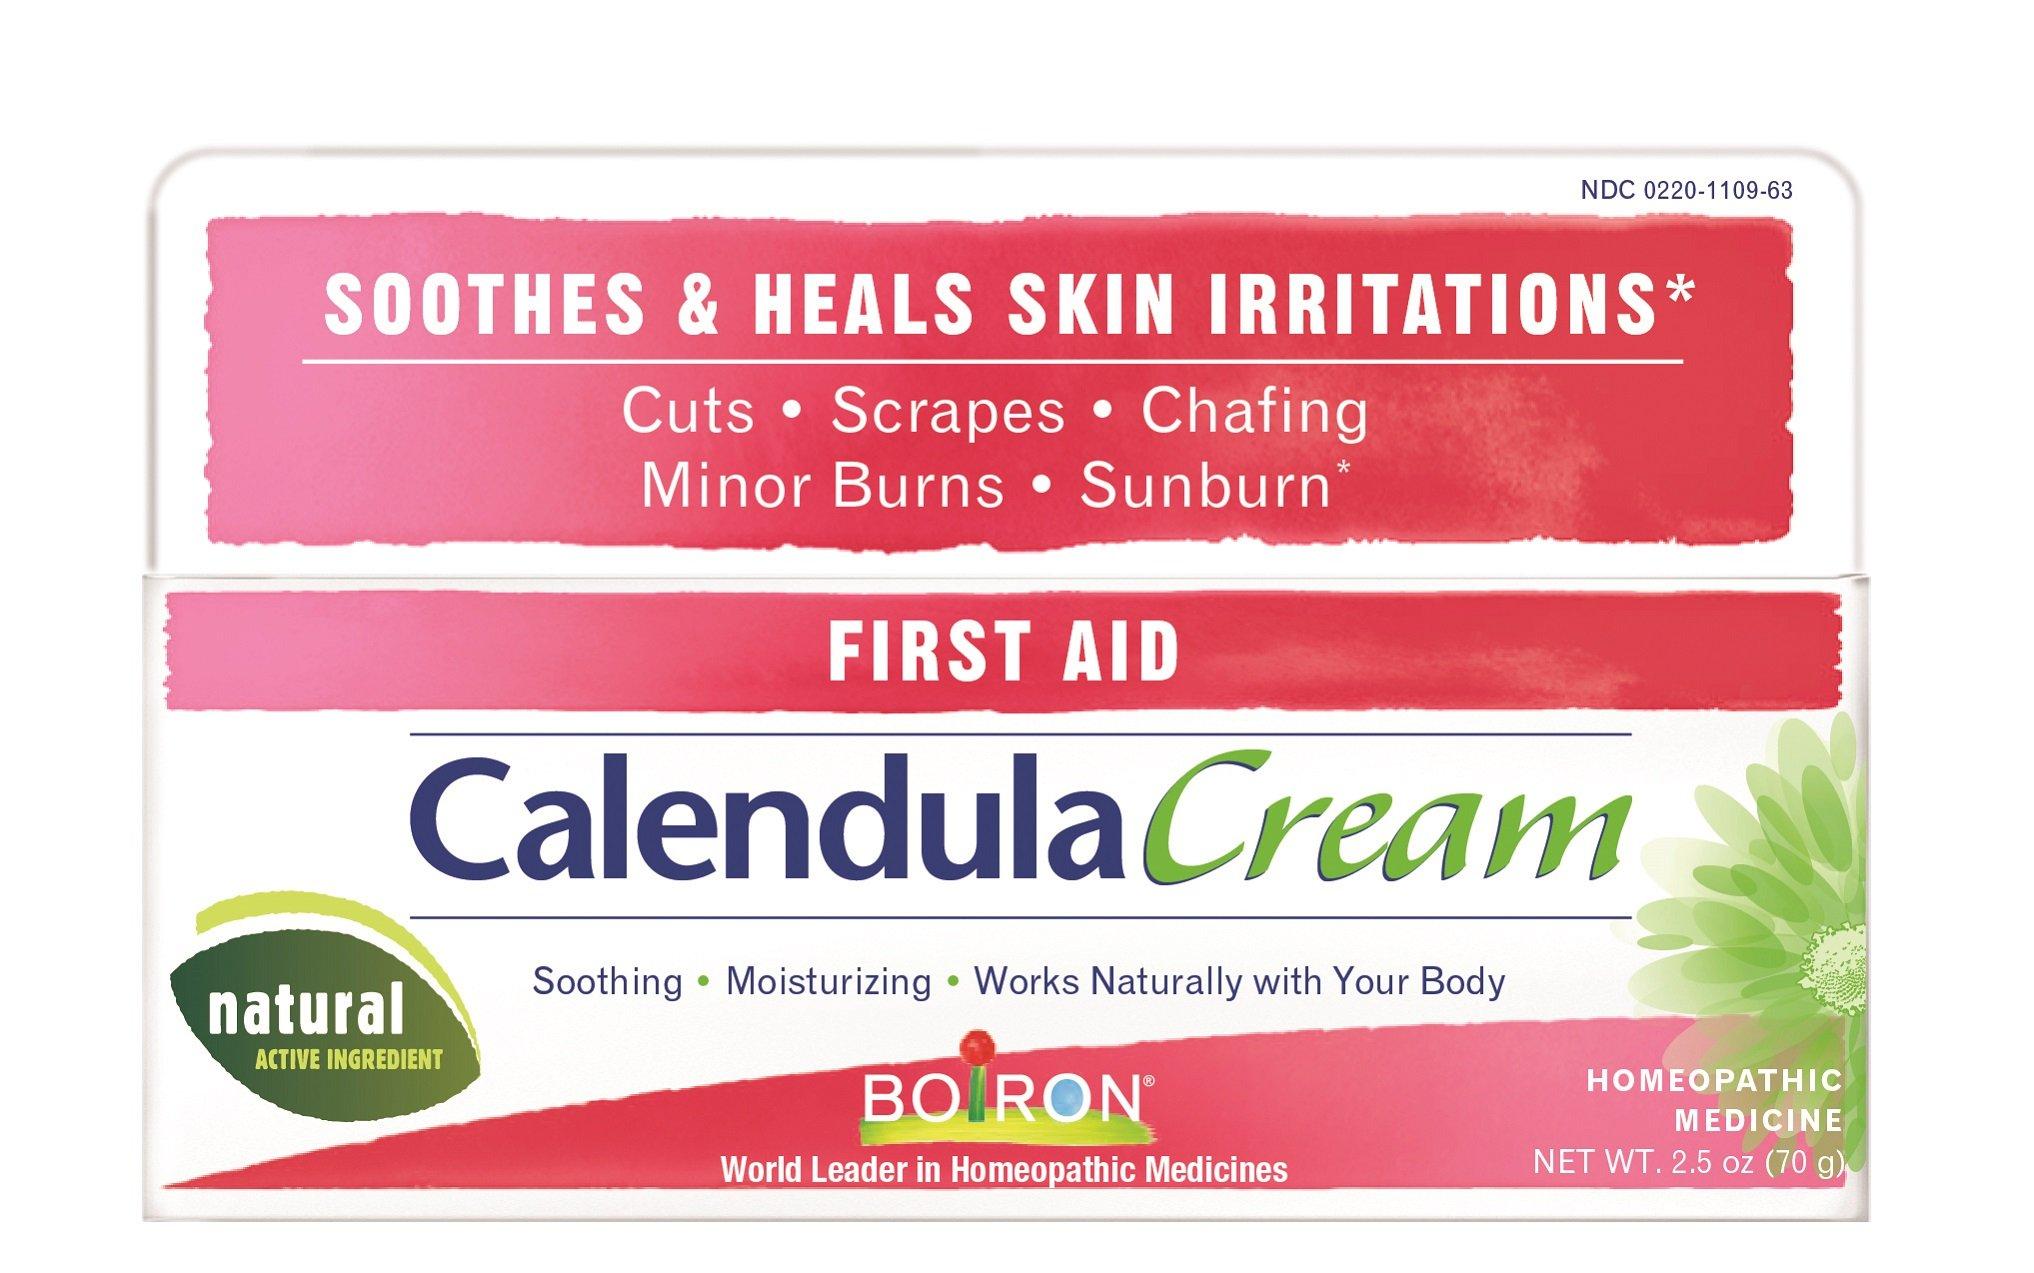 Boiron Calendula Cream, 2.5 Ounce, Homeopathic Medicine for Skin Irritation and Burns